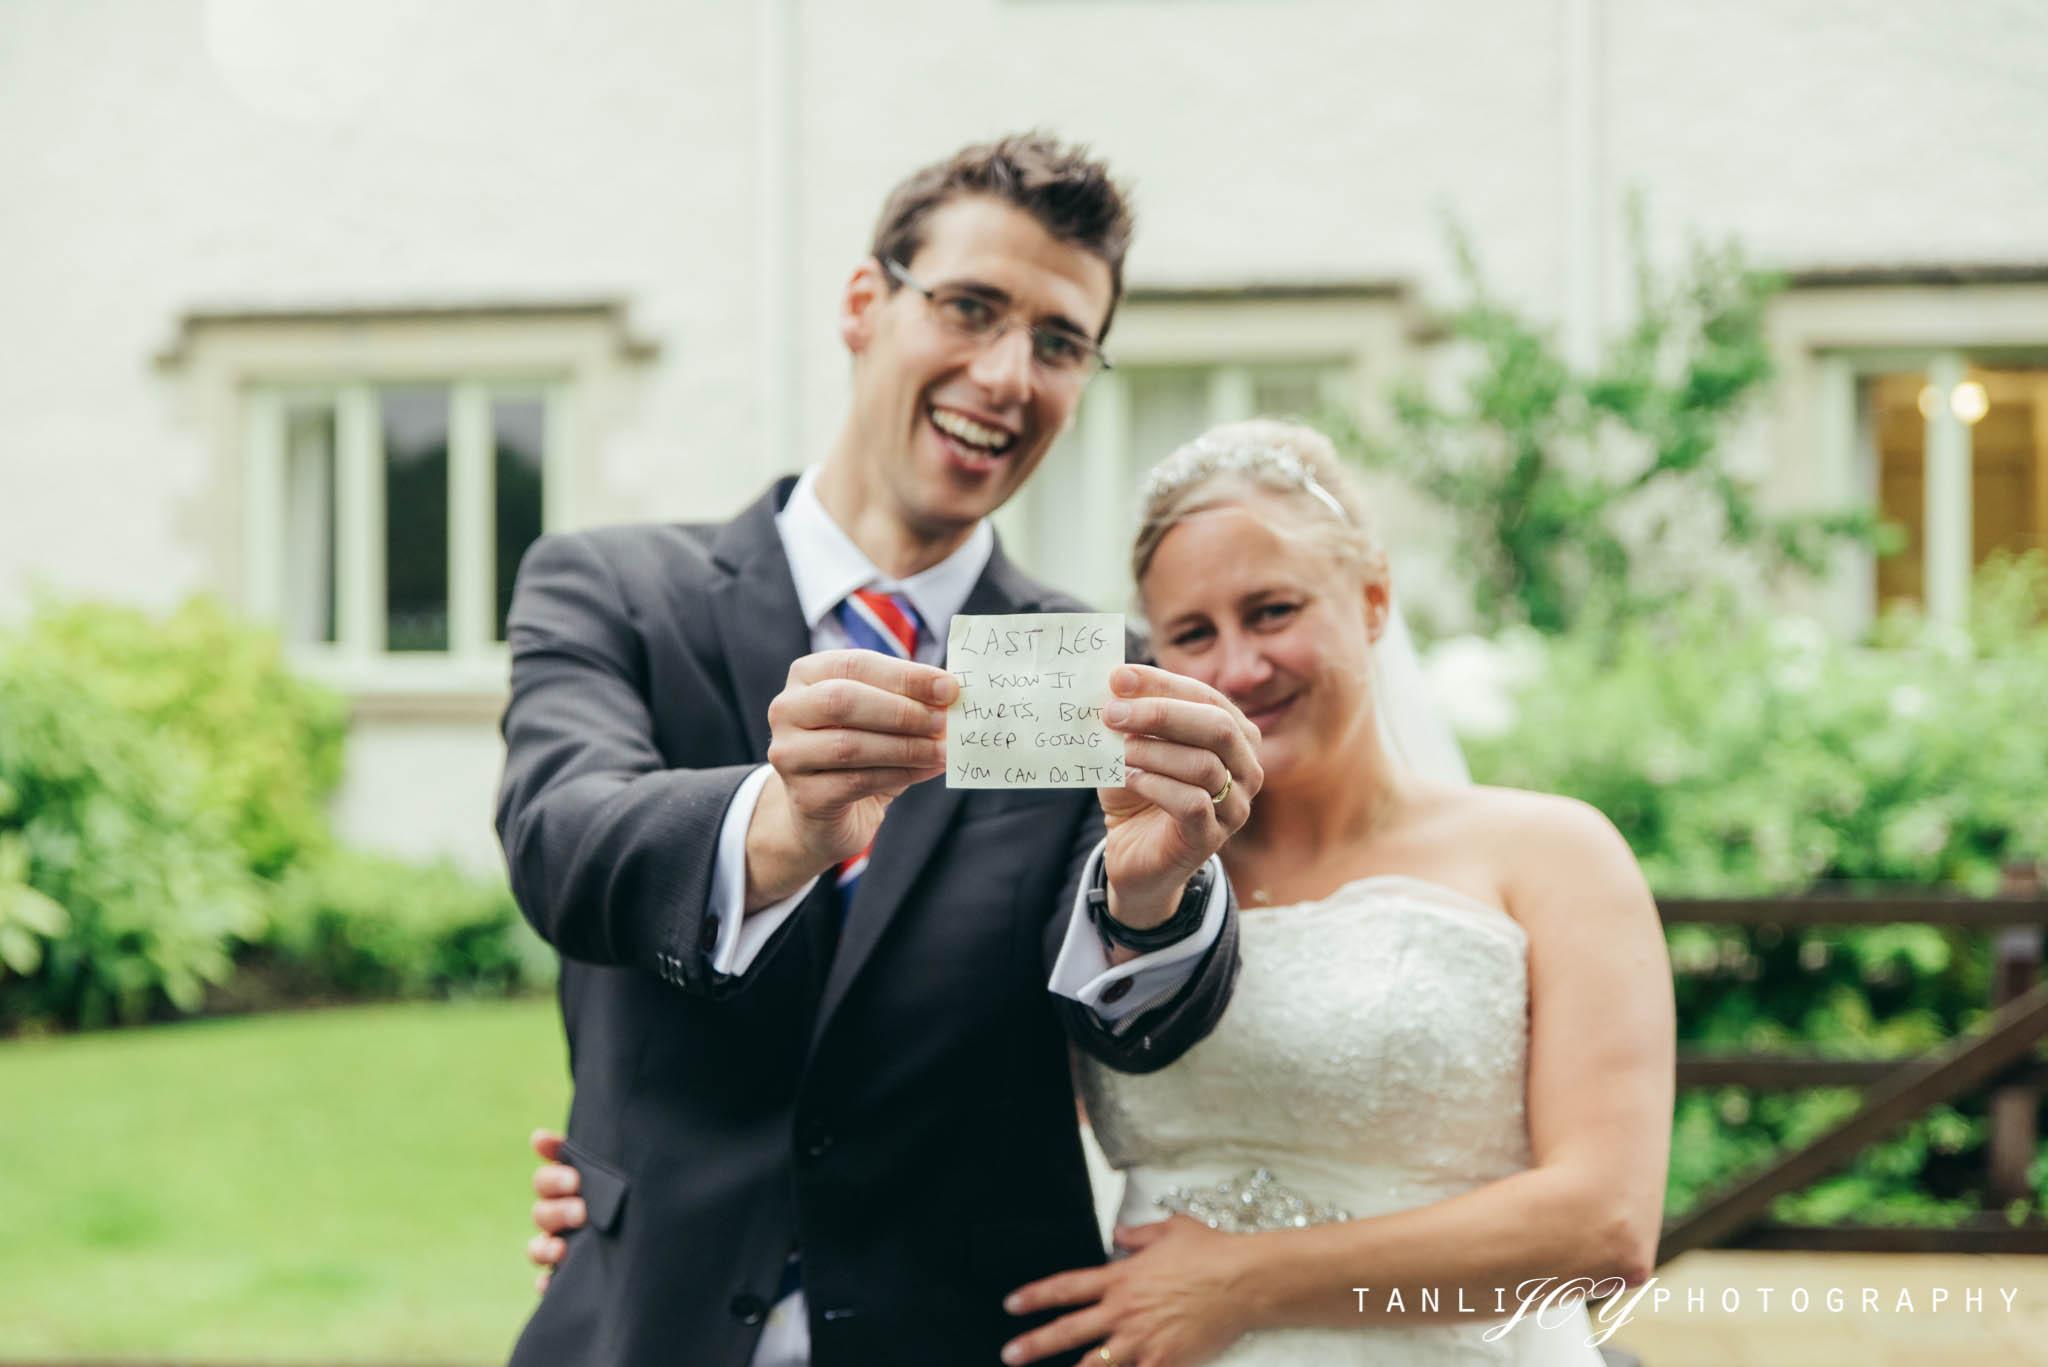 TJP 8848 8886 Gloucestershire Wedding Photographer